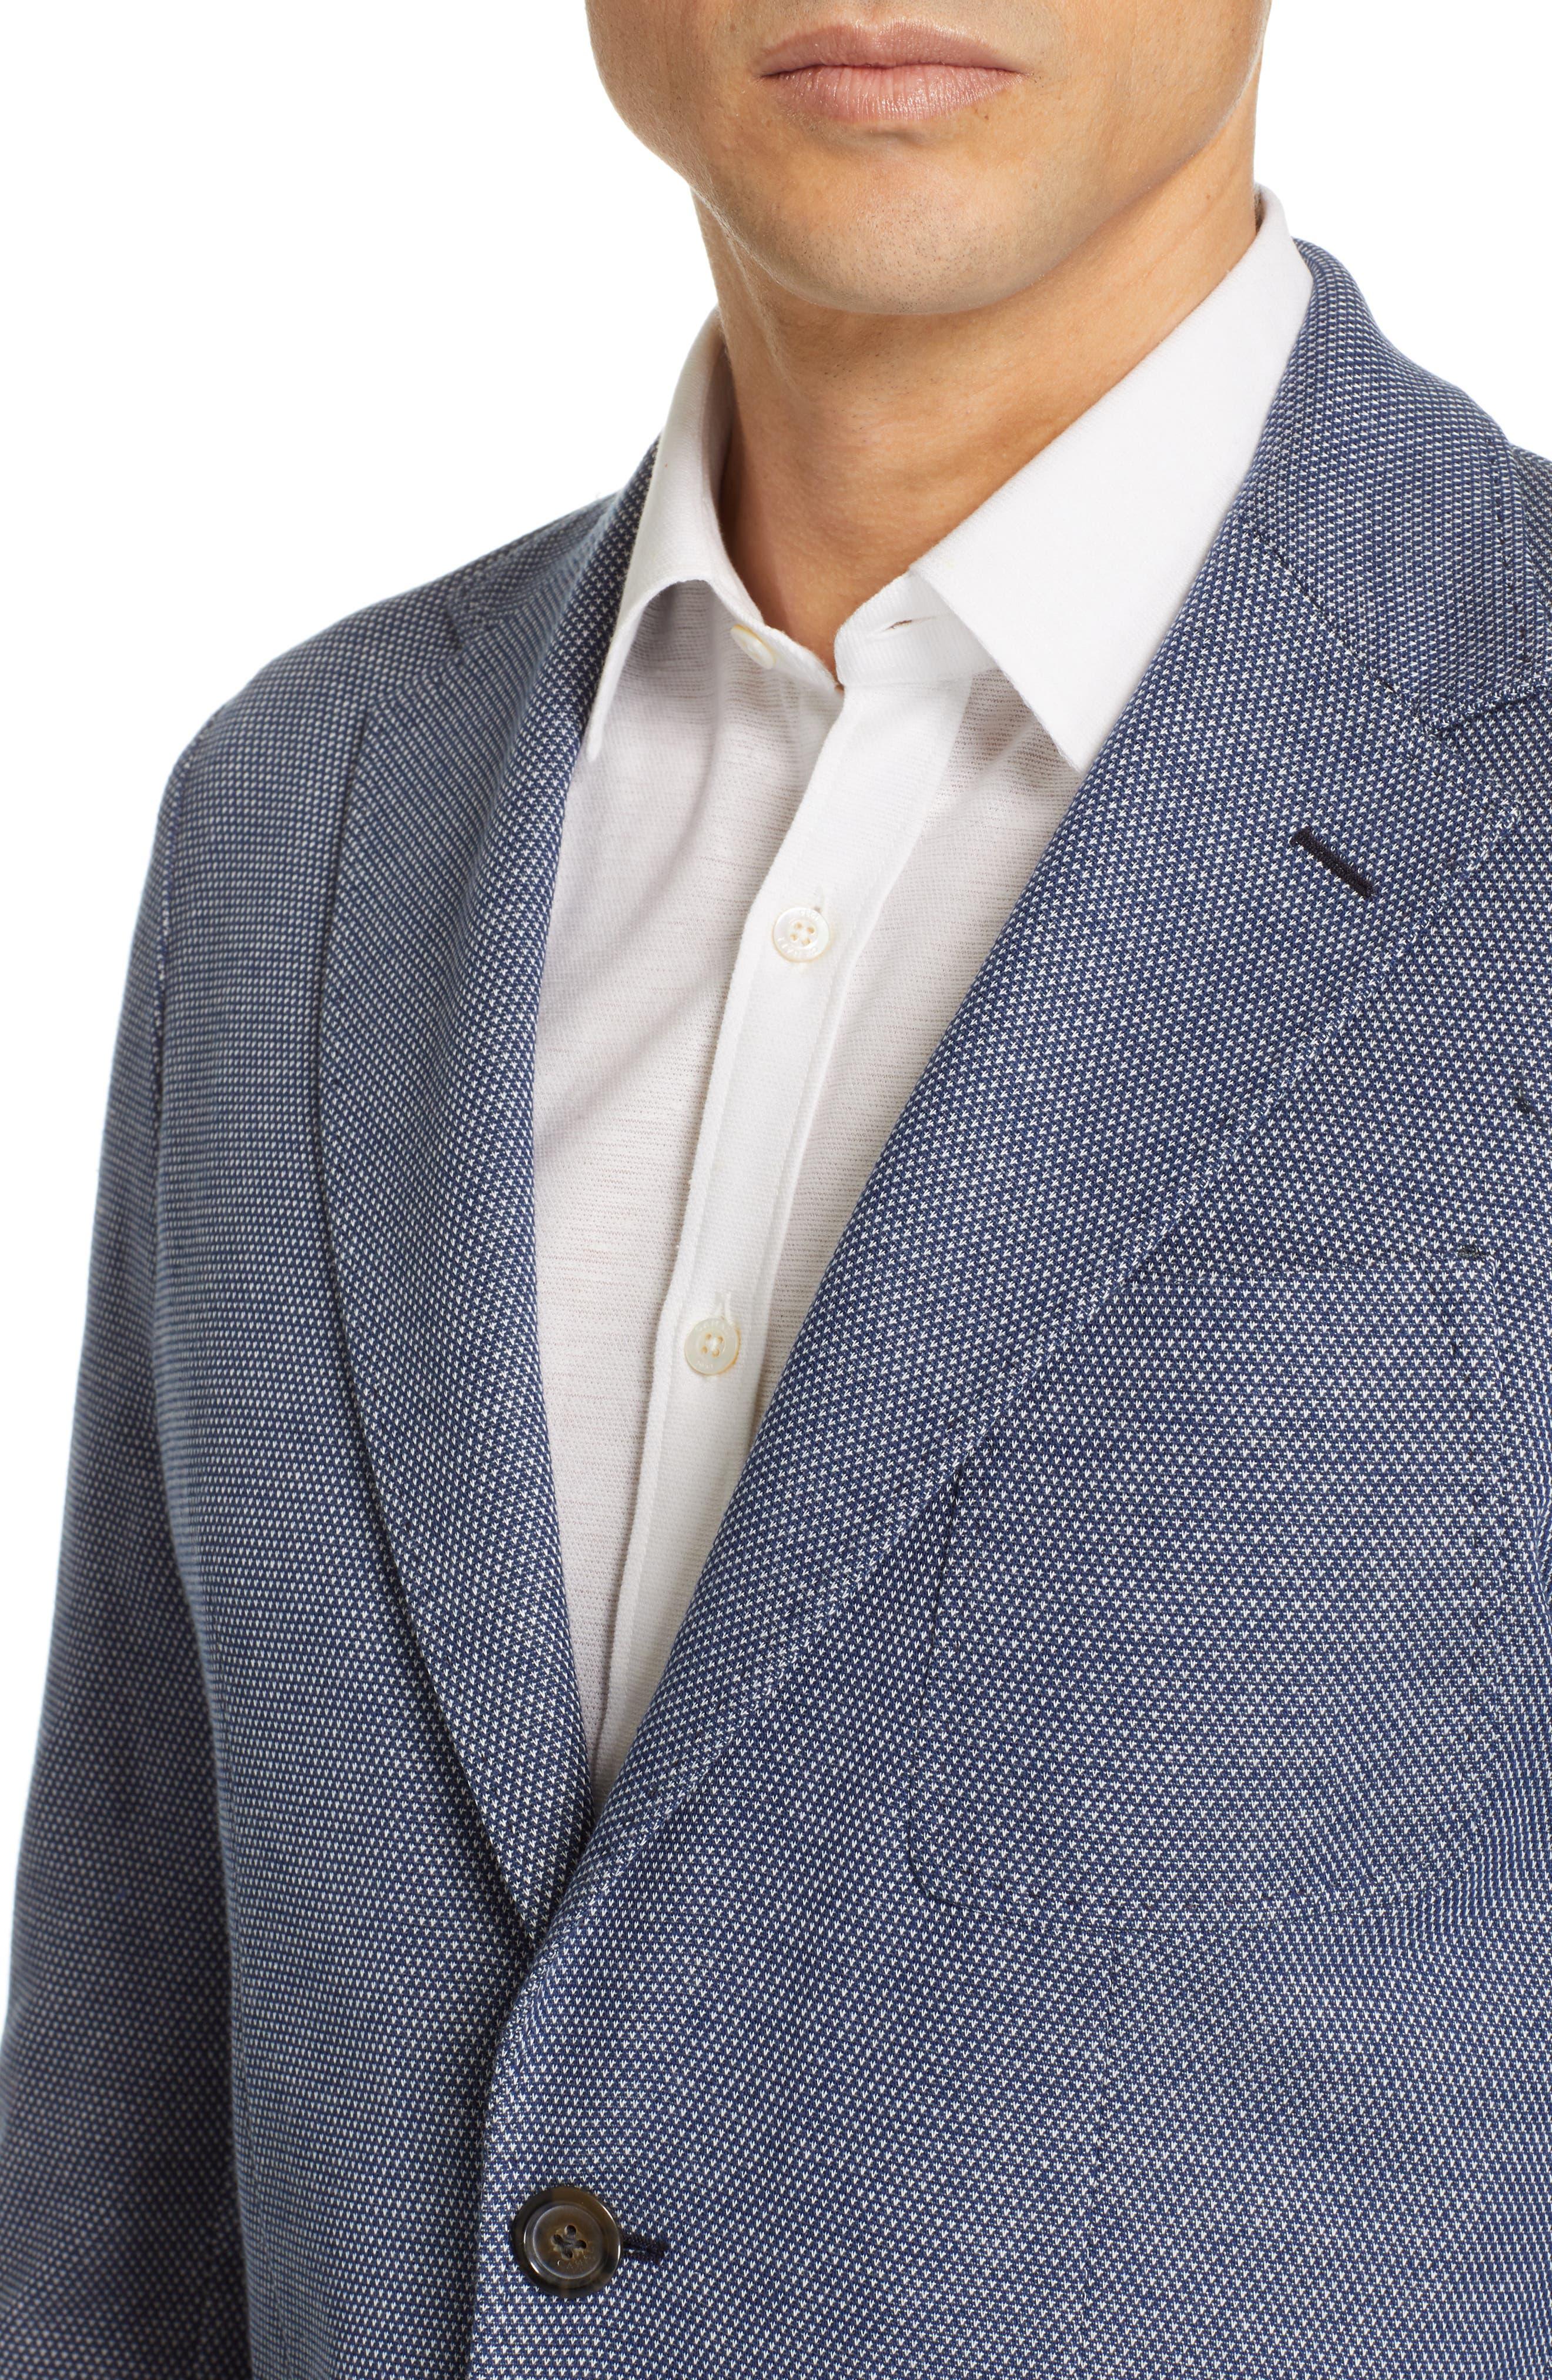 CANALI, Classic Fit Cotton Blend Sport Coat, Alternate thumbnail 4, color, NAVY